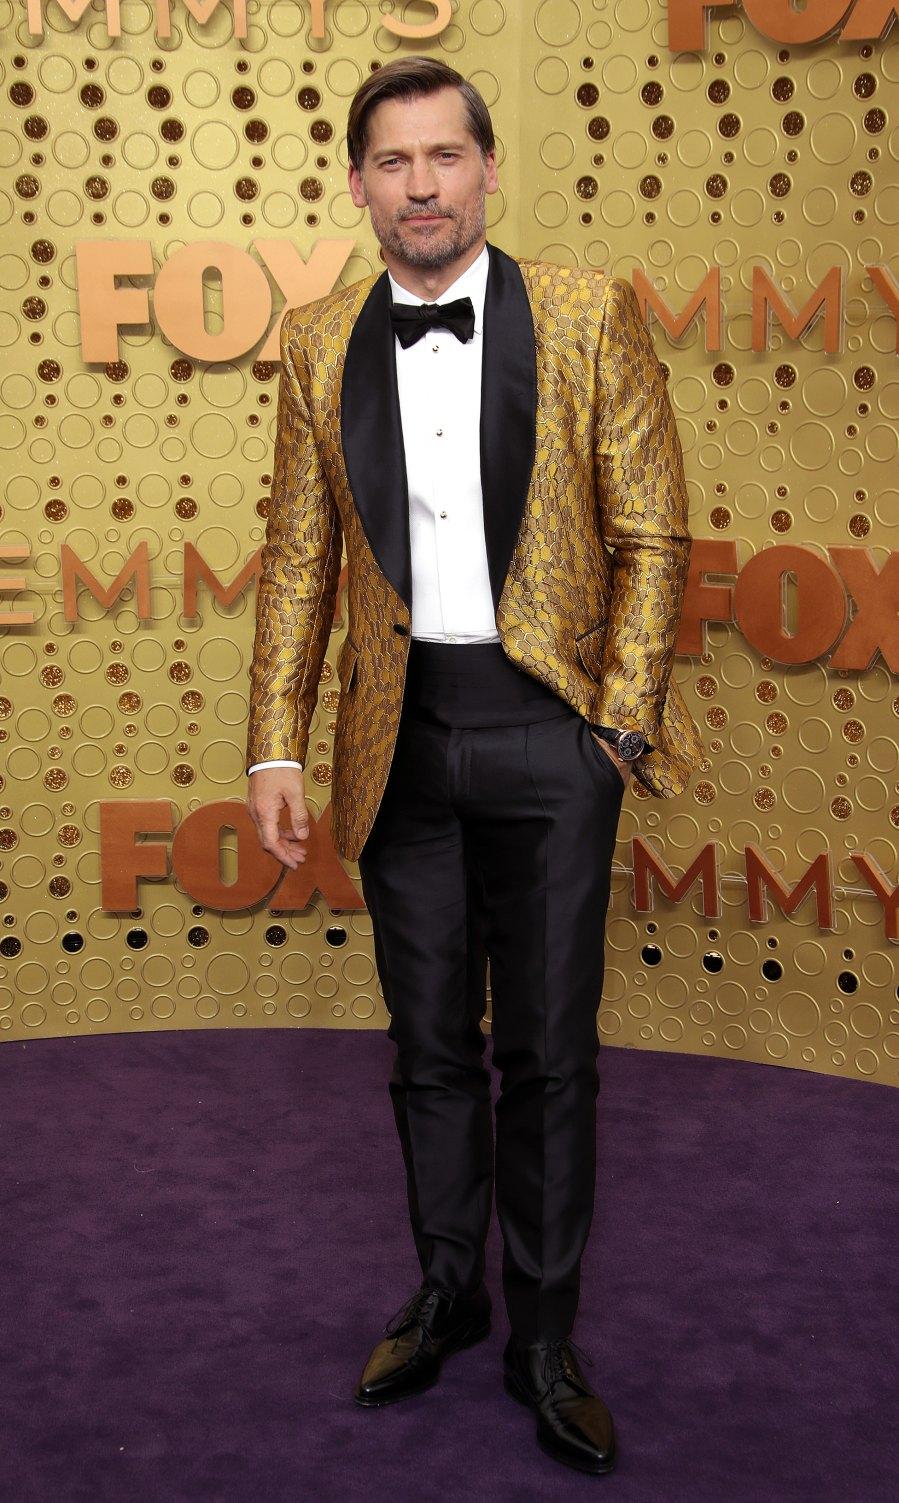 Emmys 2019 Hottest Hunks - Nikolaj Coster-Waldeau